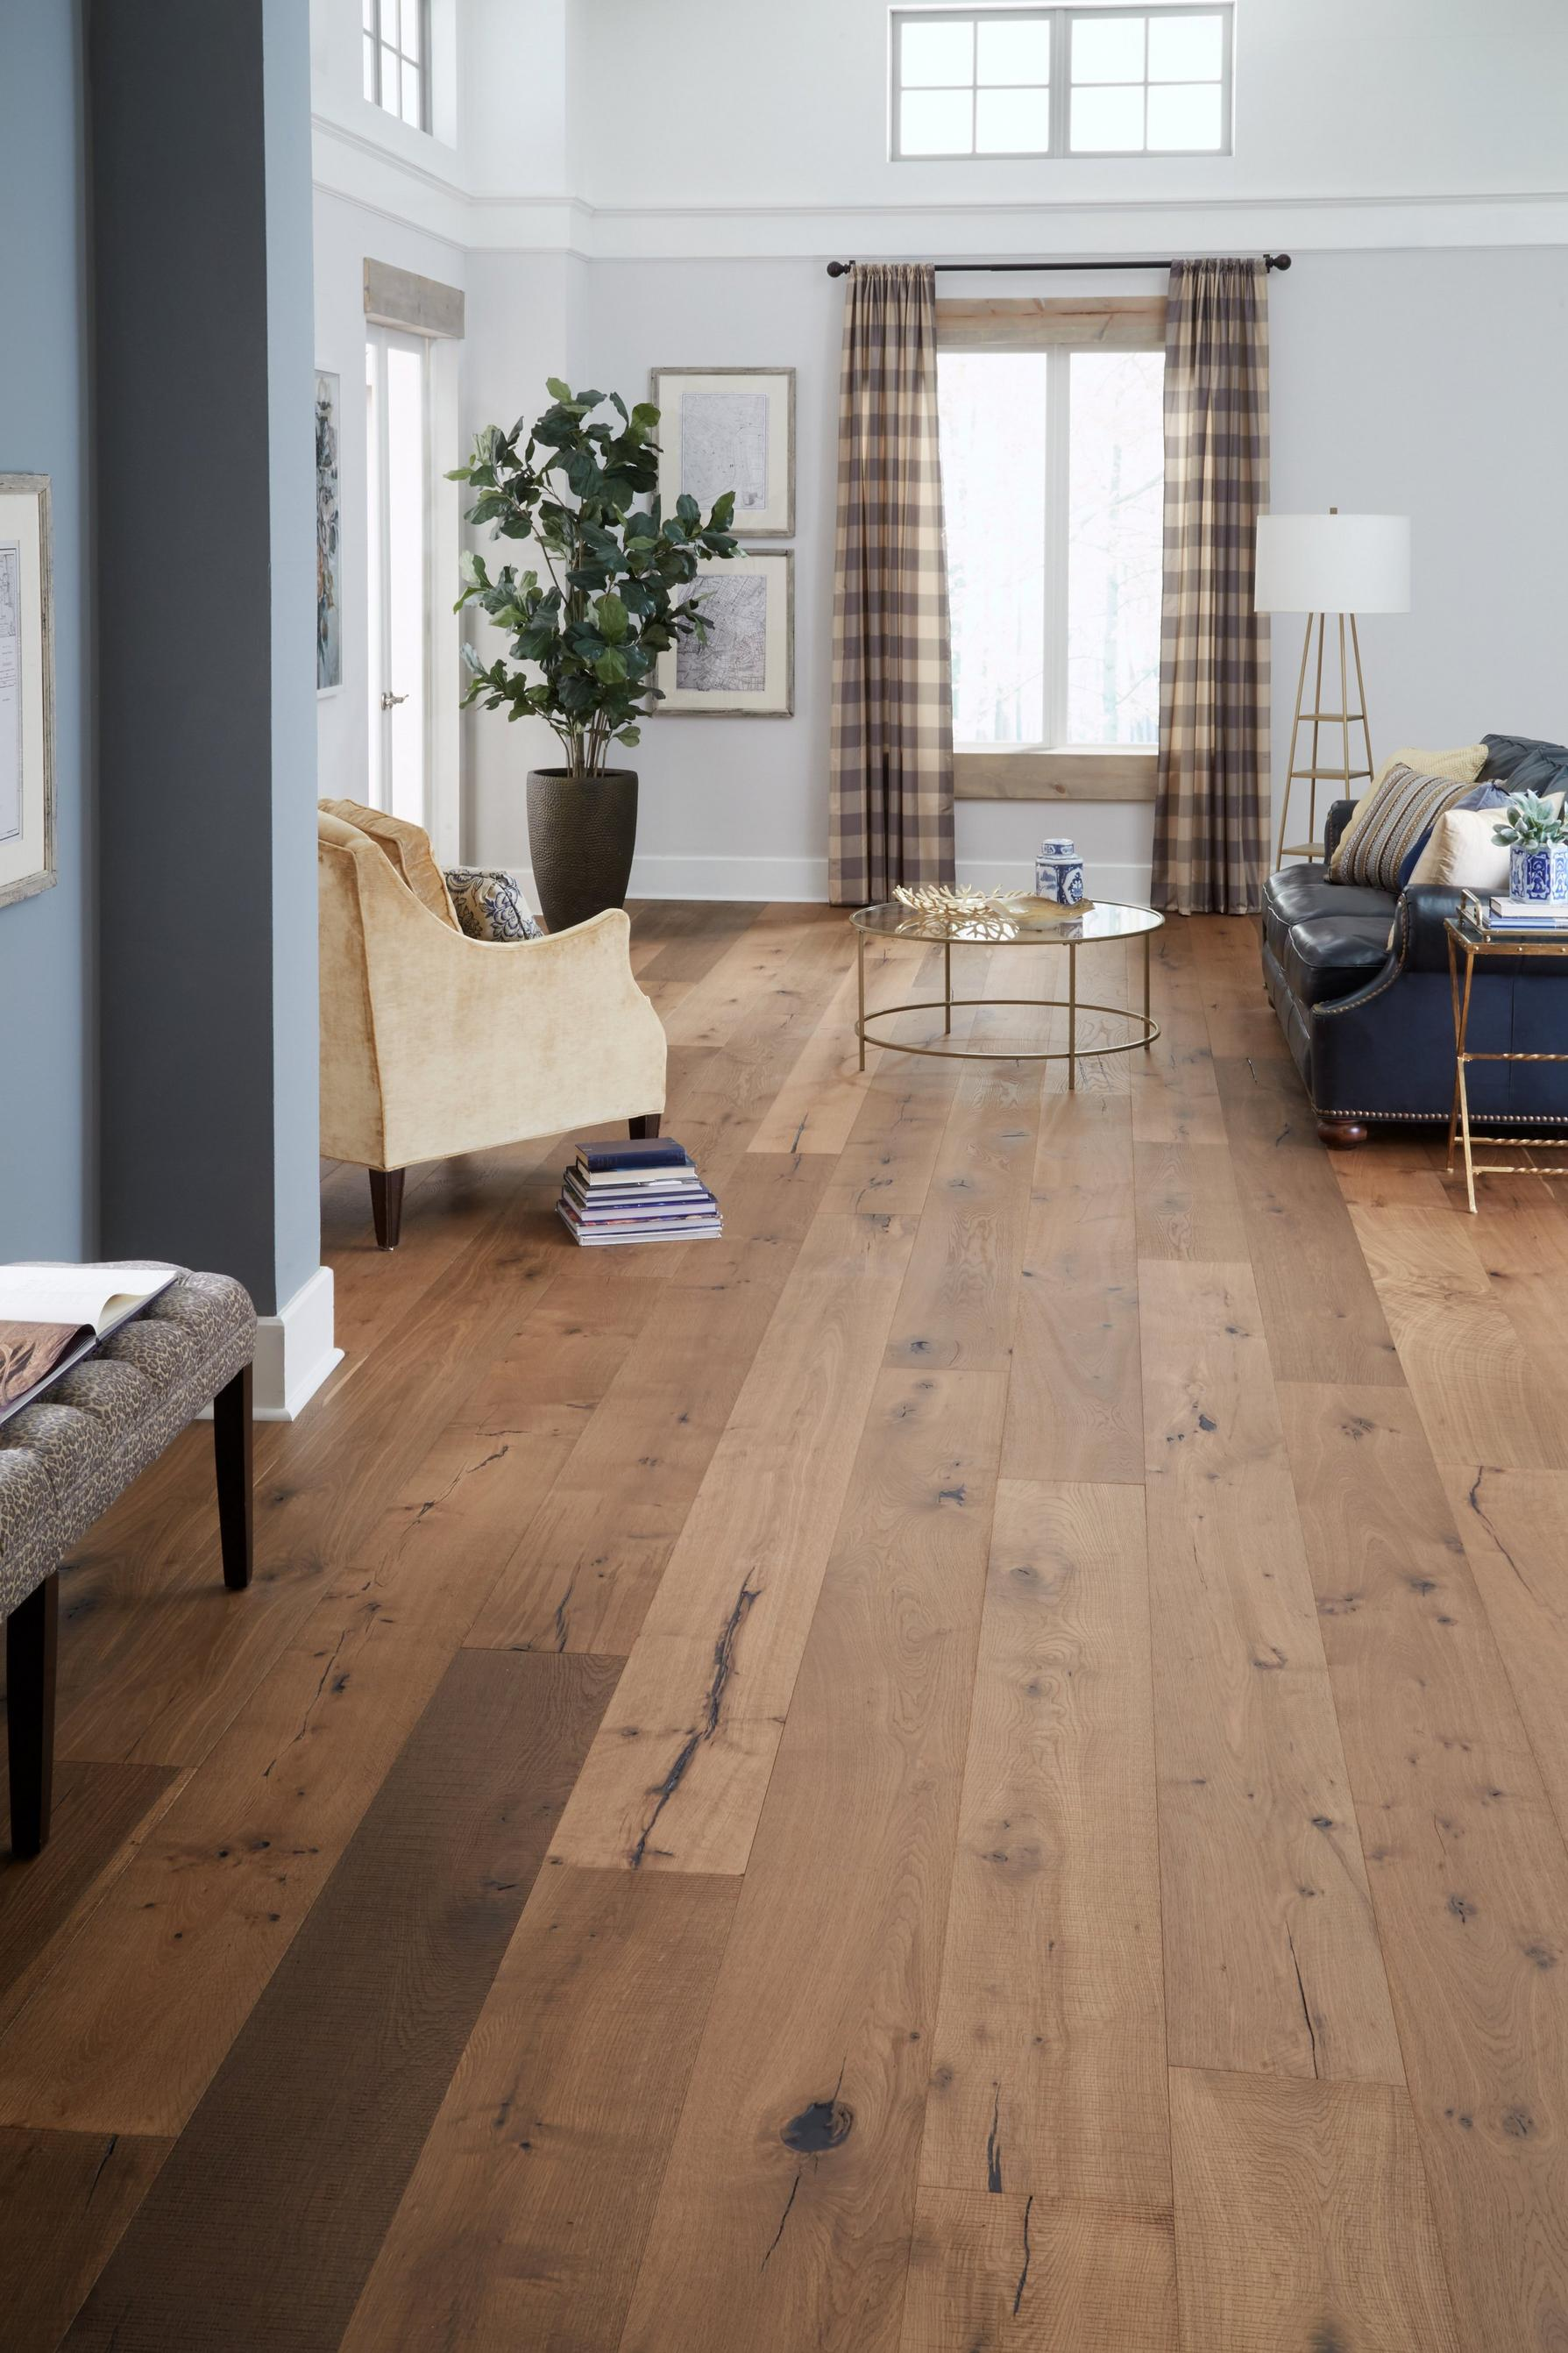 photos vama timbercraft barnwood floor floors pergo from wood distressed complete laminate reclaimed barn simplistic flooring